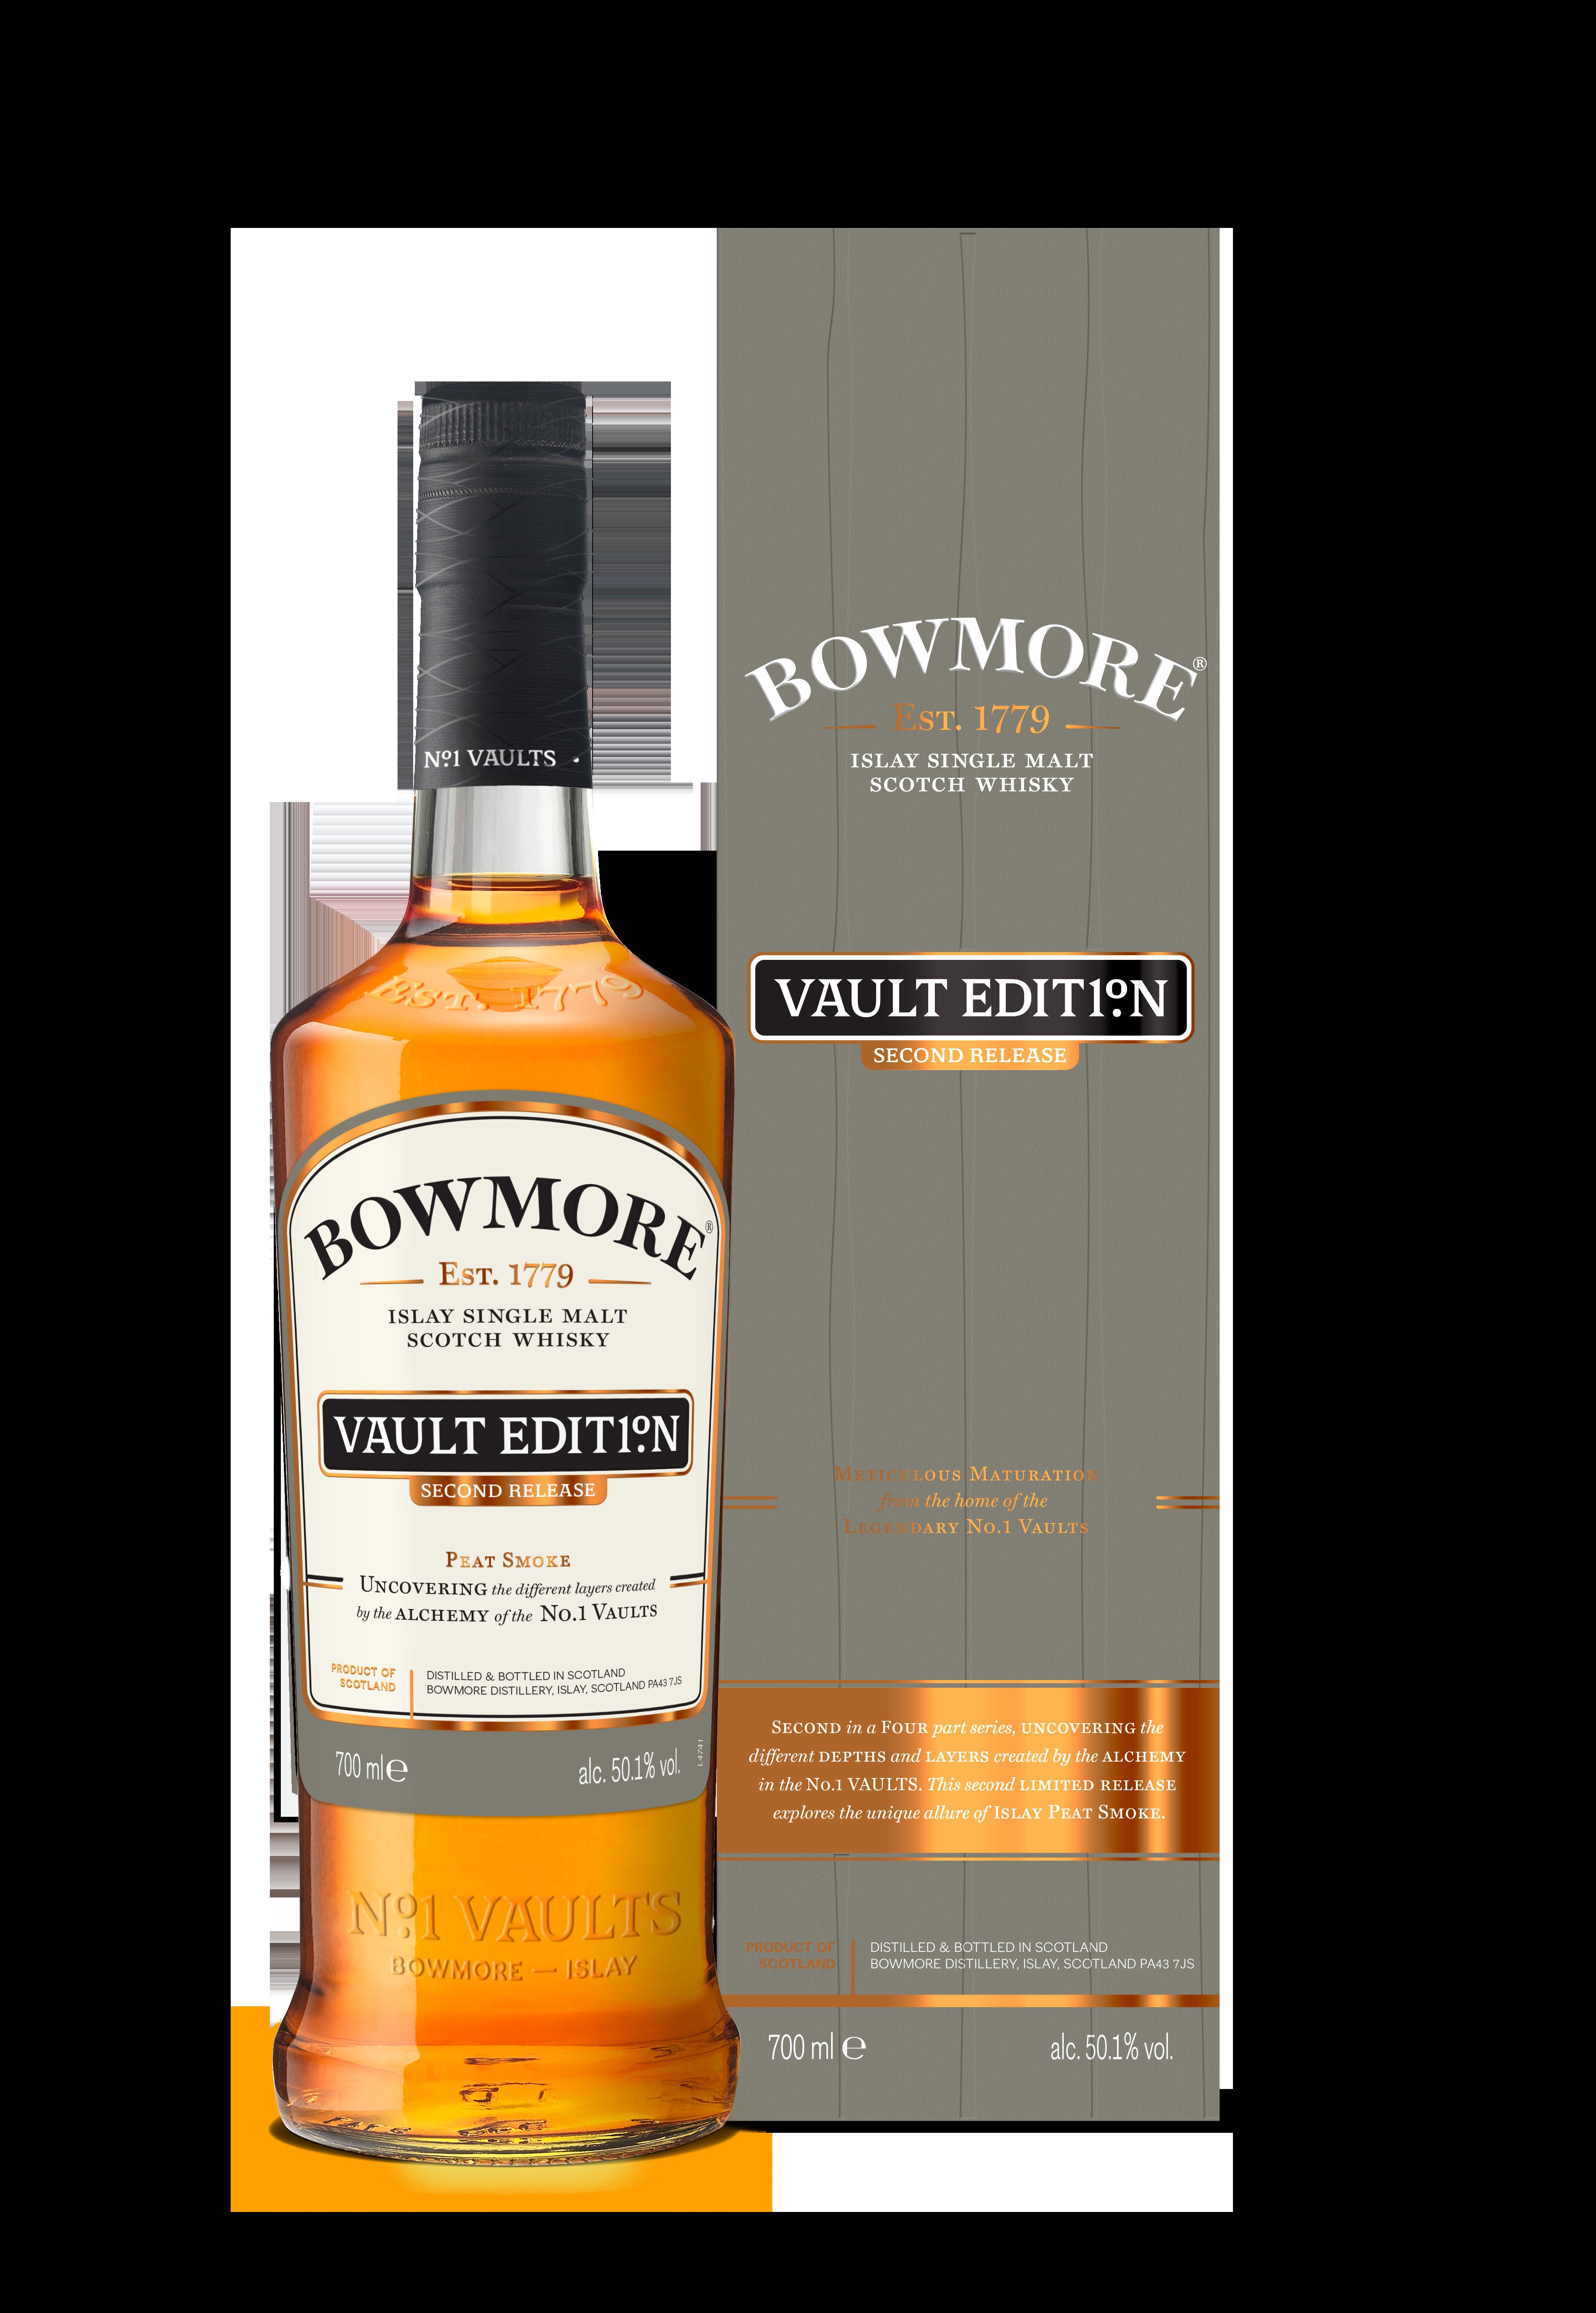 https://www.bowmore.com/sites/default/files/2019-09/bowmore-ve-second-release-700ml_0.png